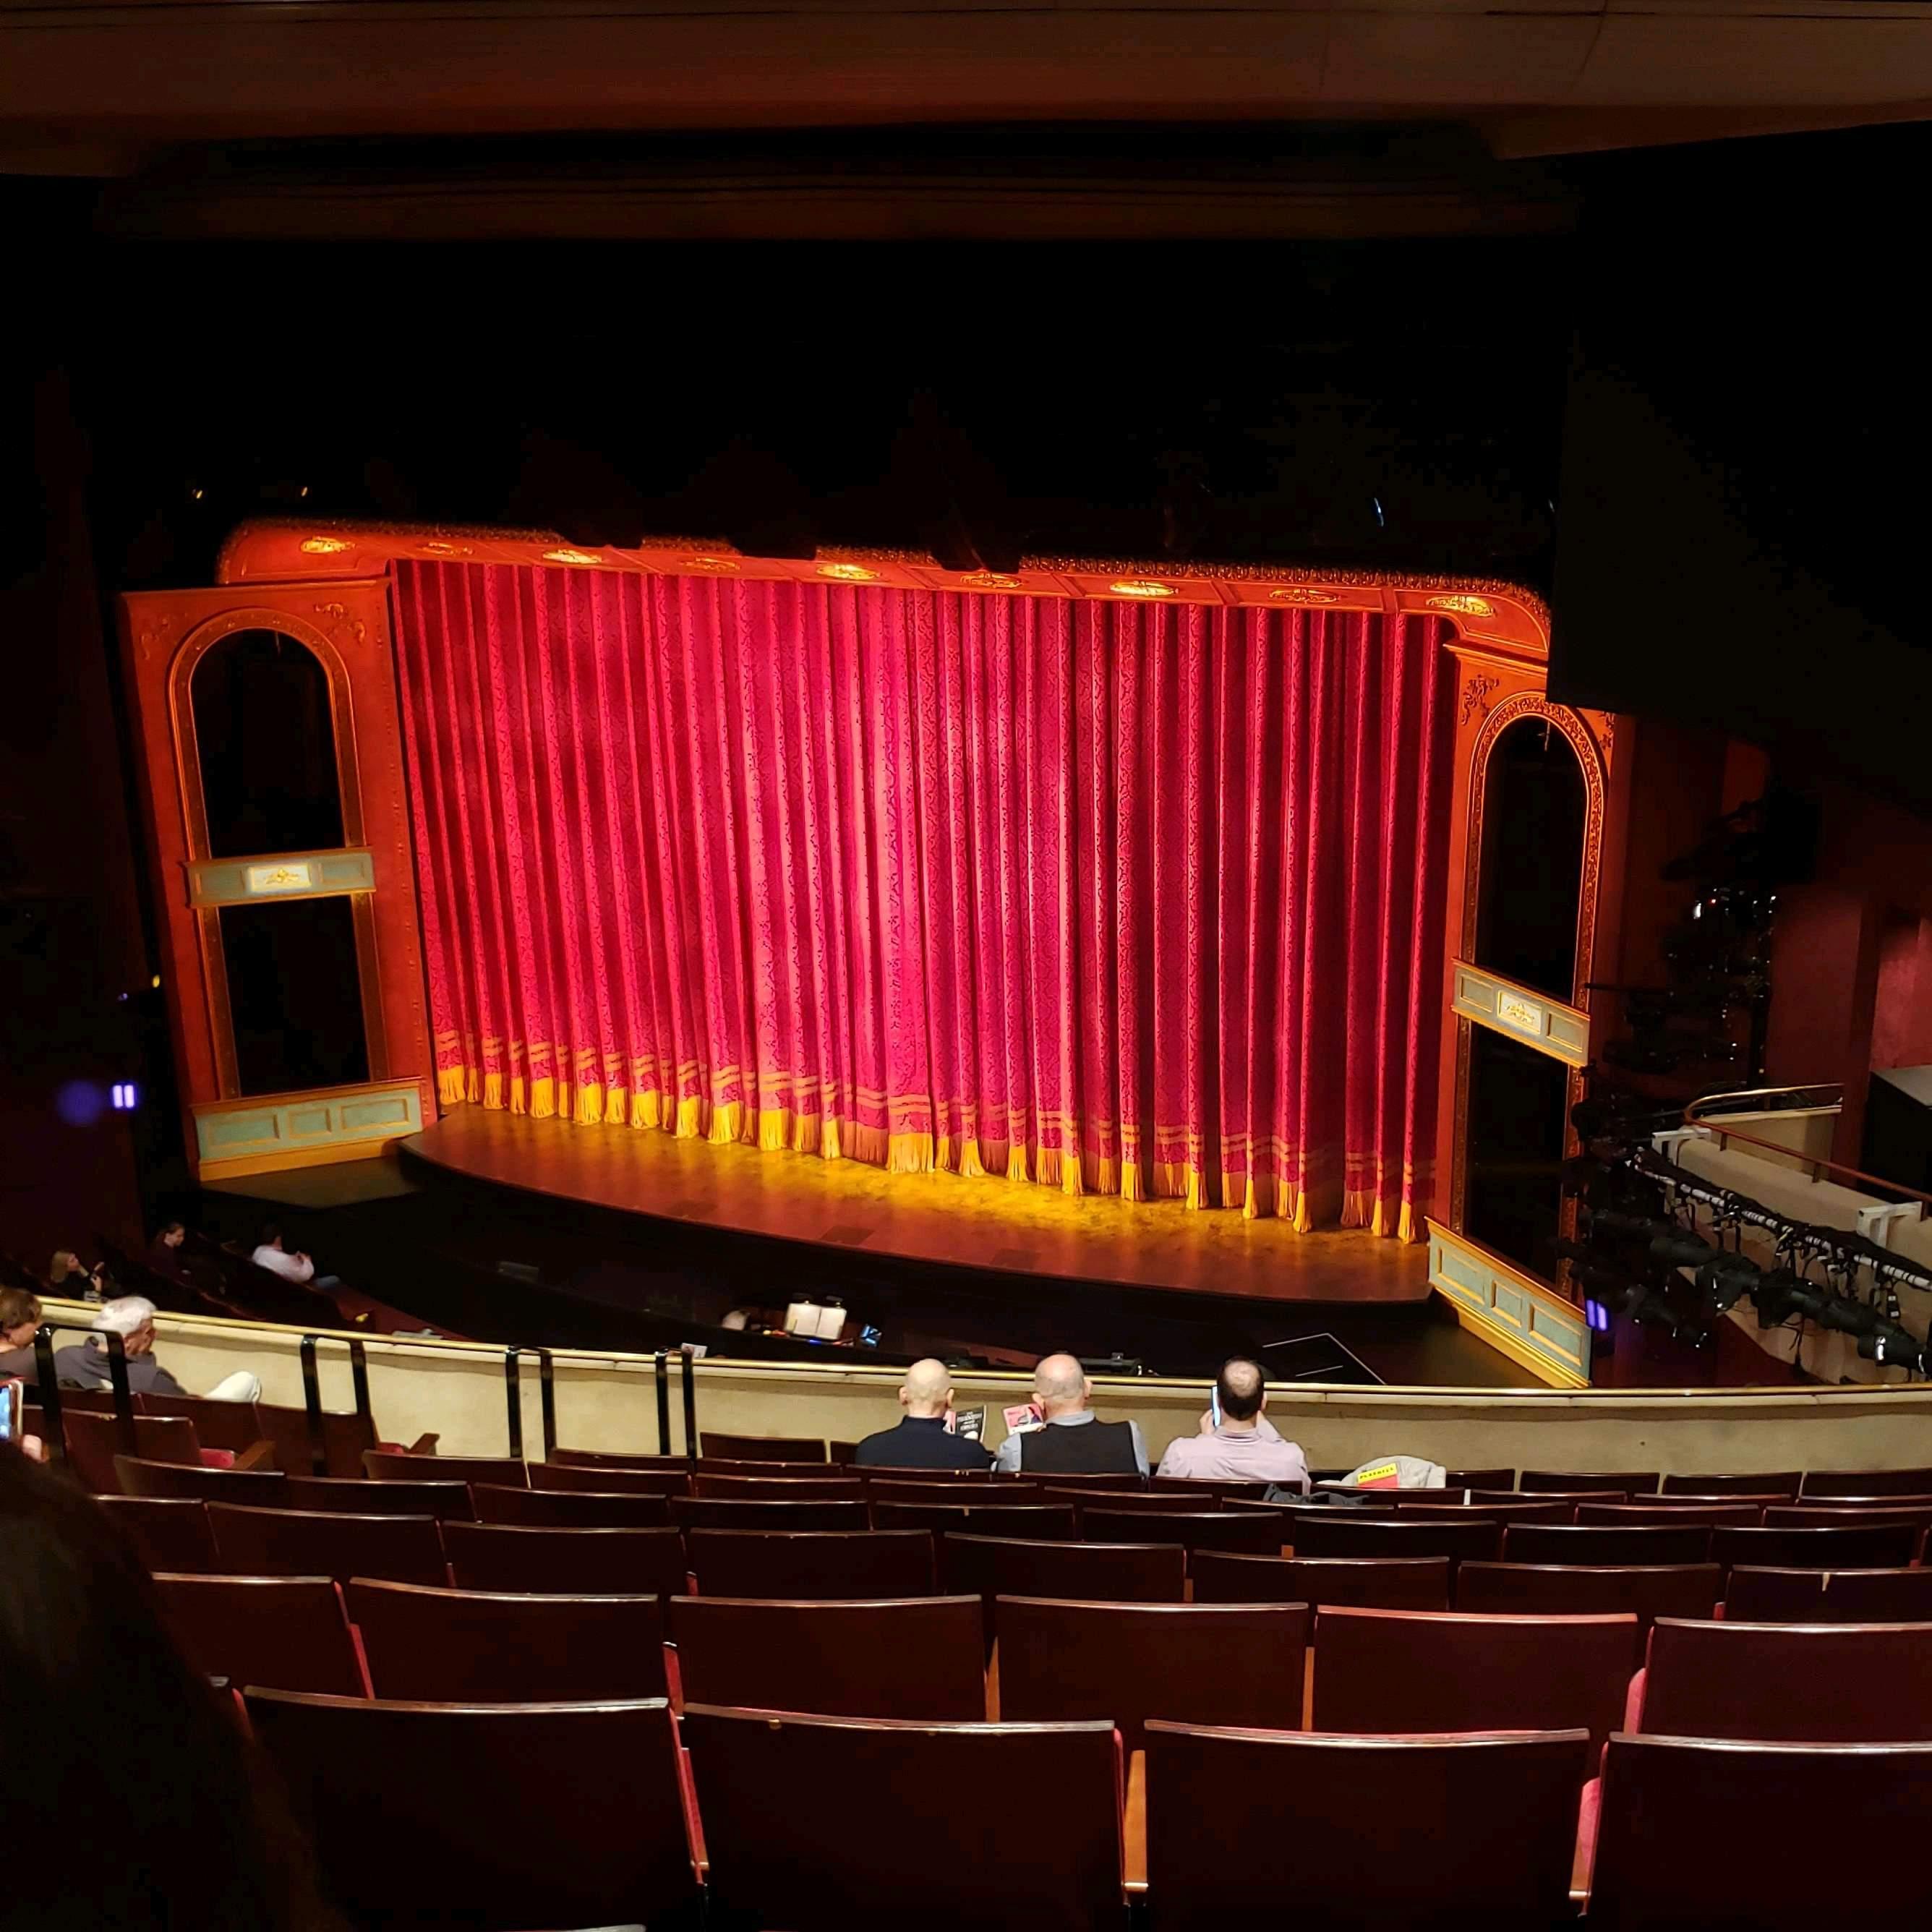 Marquis Theatre Section Mezz Row K Seat 18